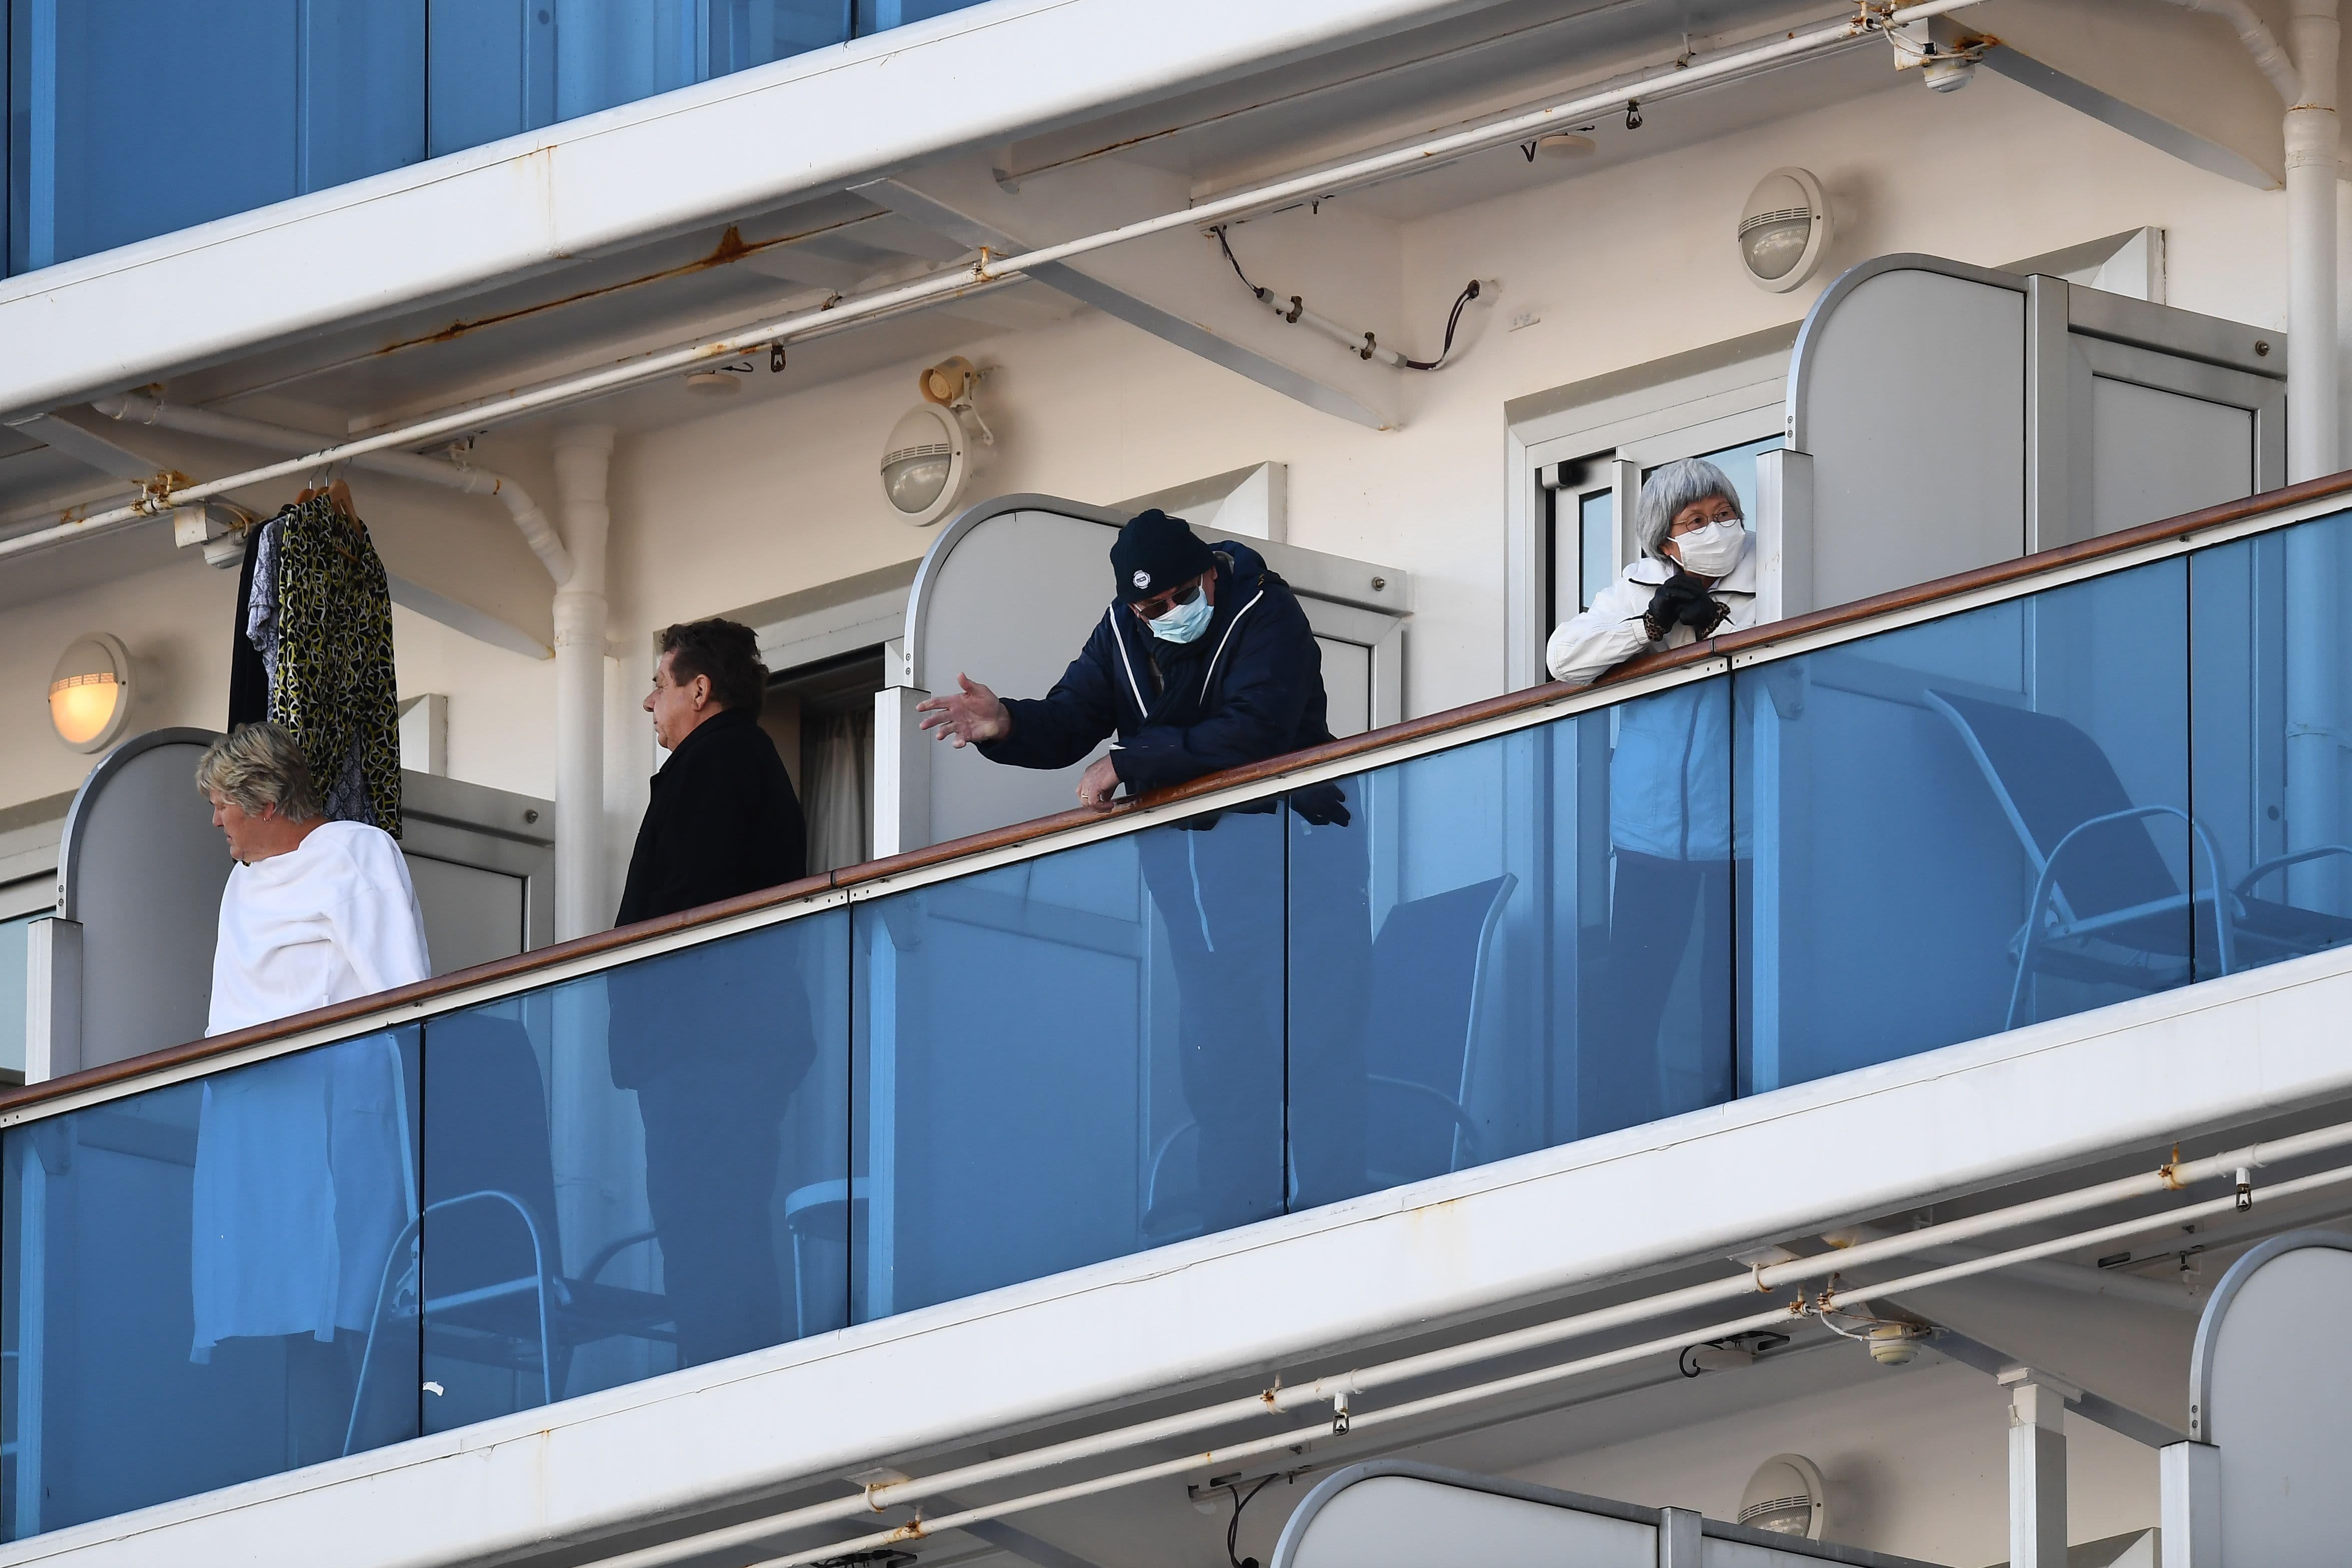 Coronavirus quarantine on a cruise ship: 'Trapped in your bathroom'